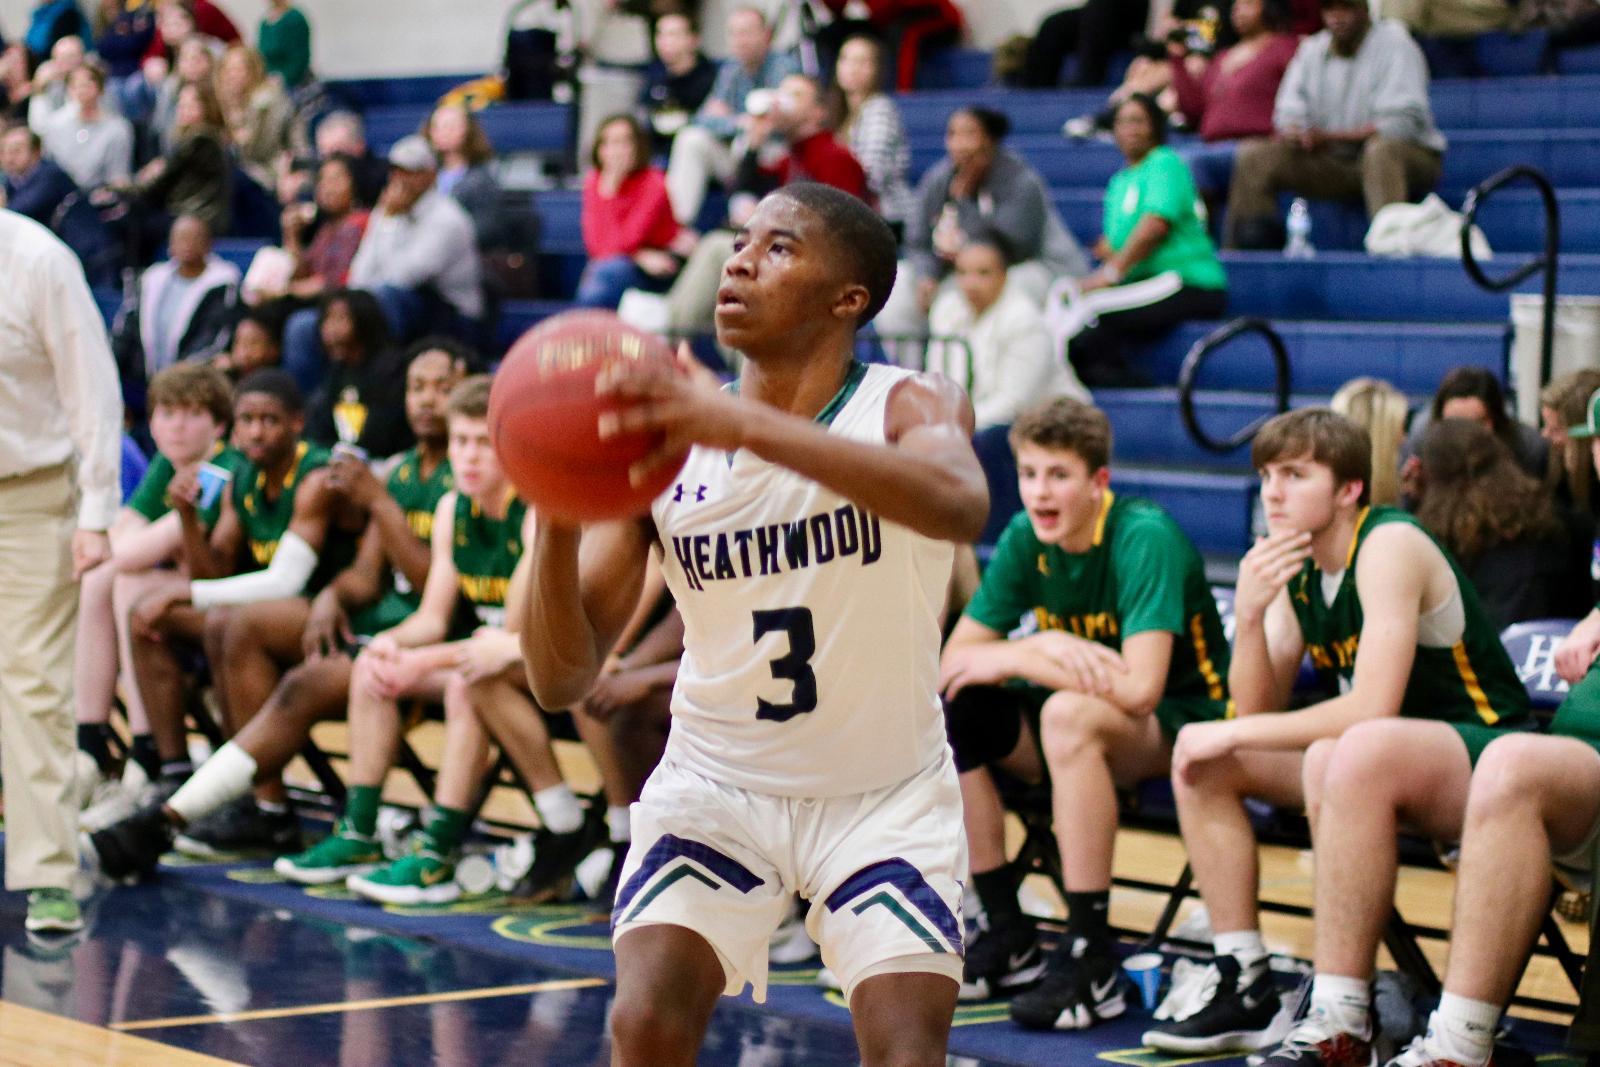 2019-20 Boys Basketball Program Information